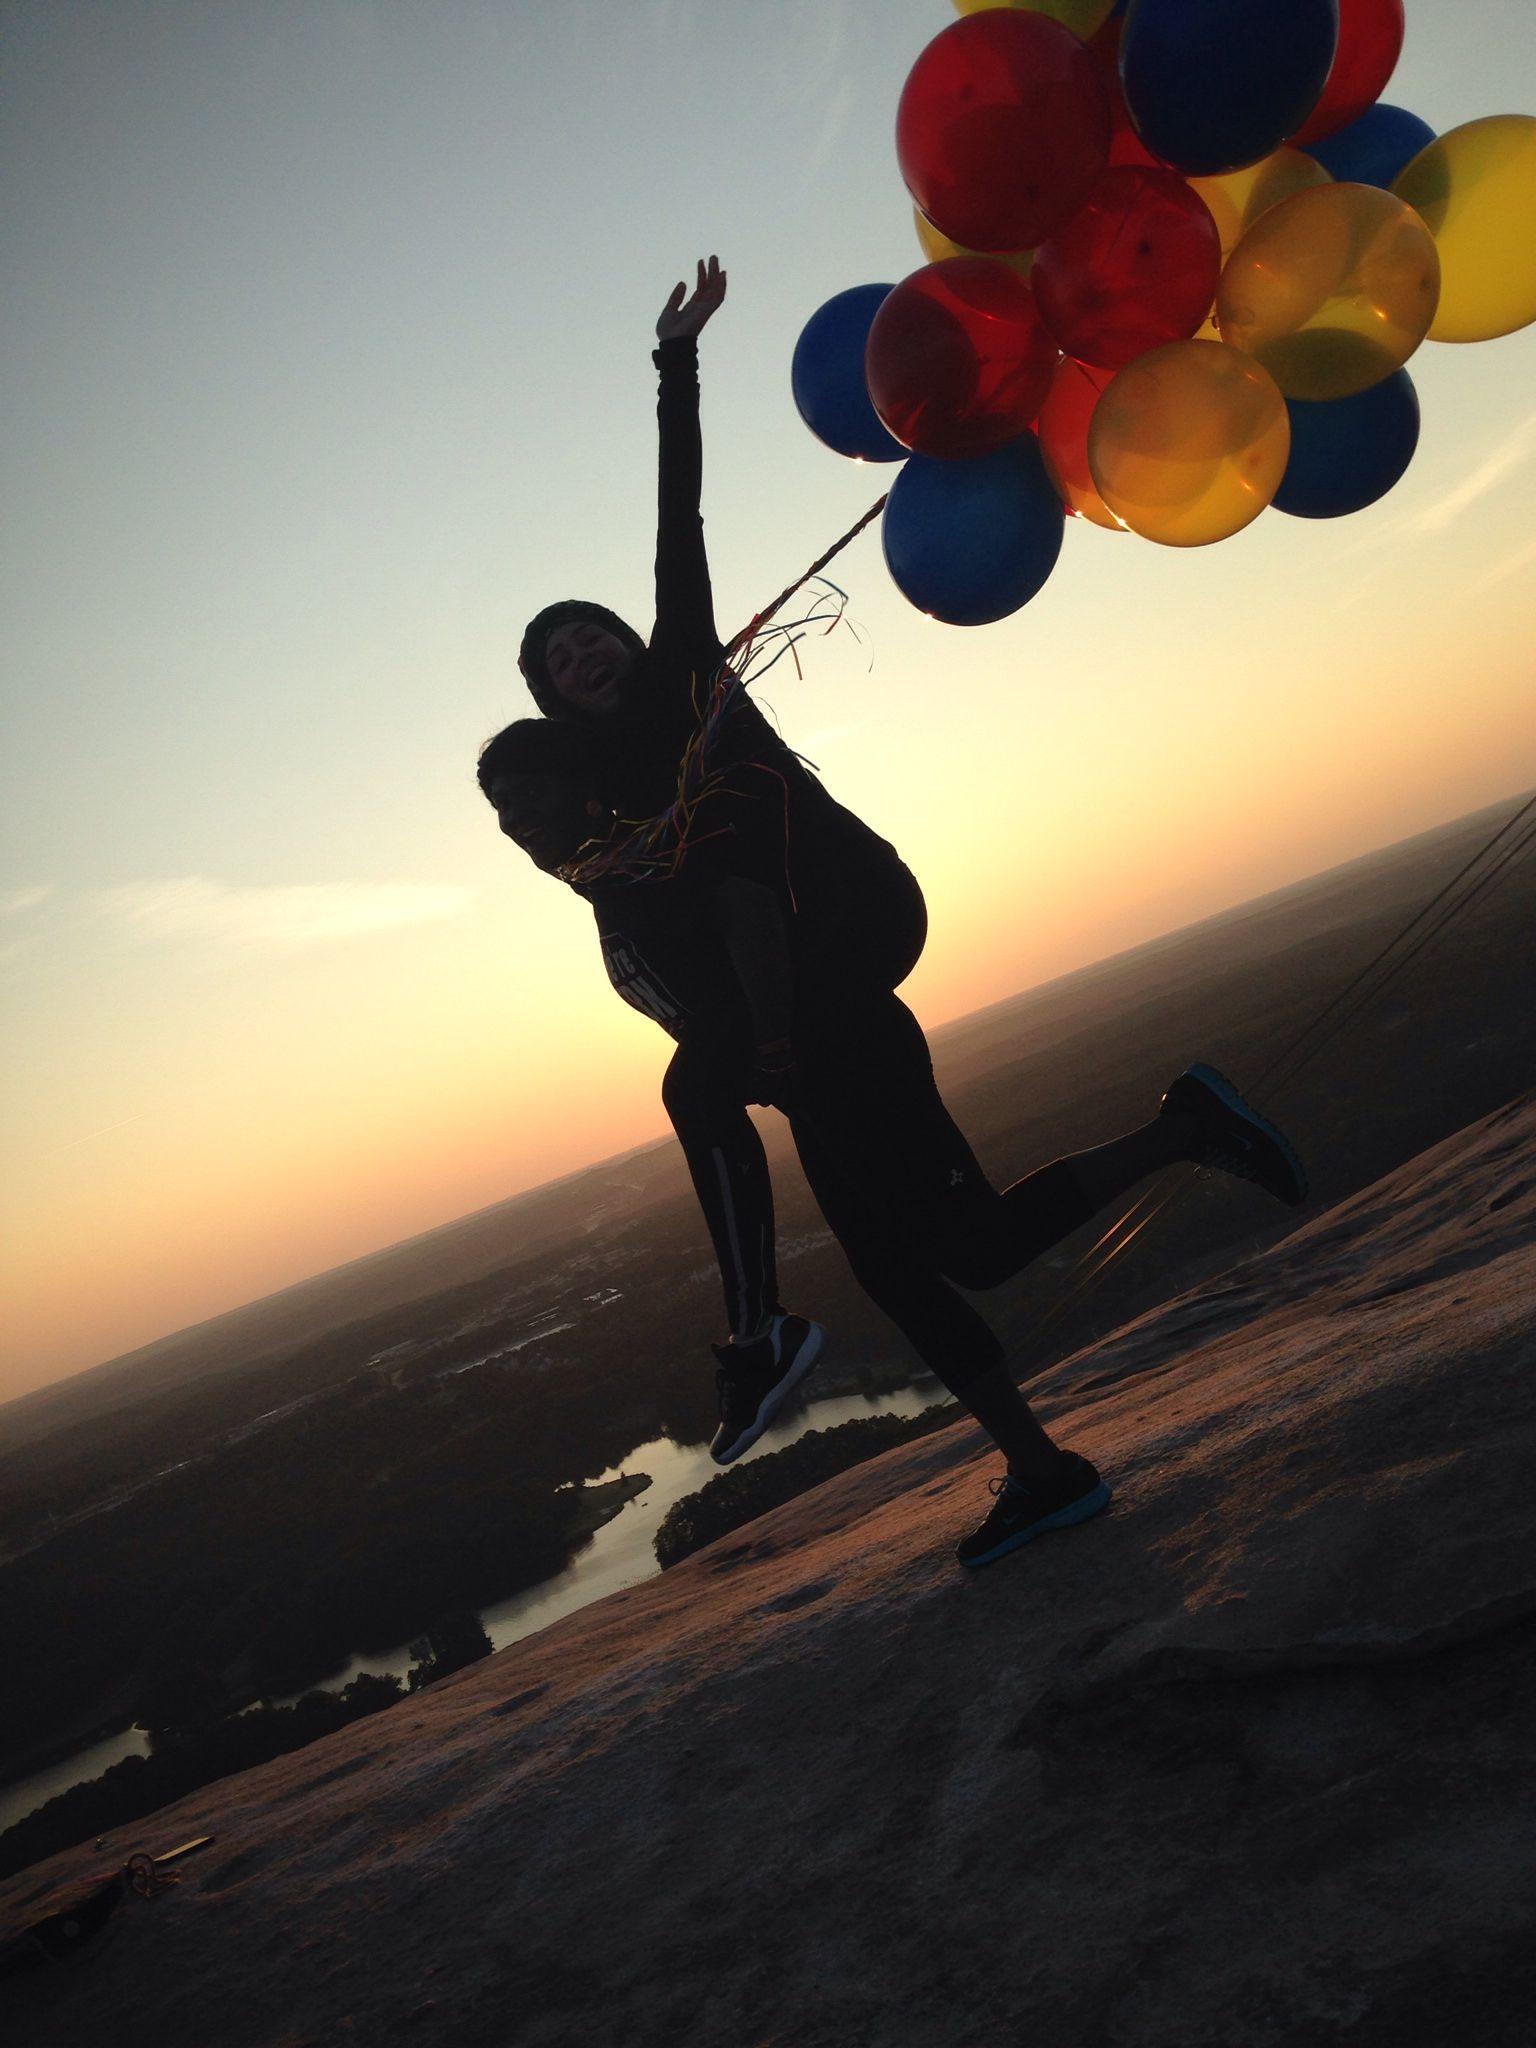 #Balloons #photography #bestfriends #birthday